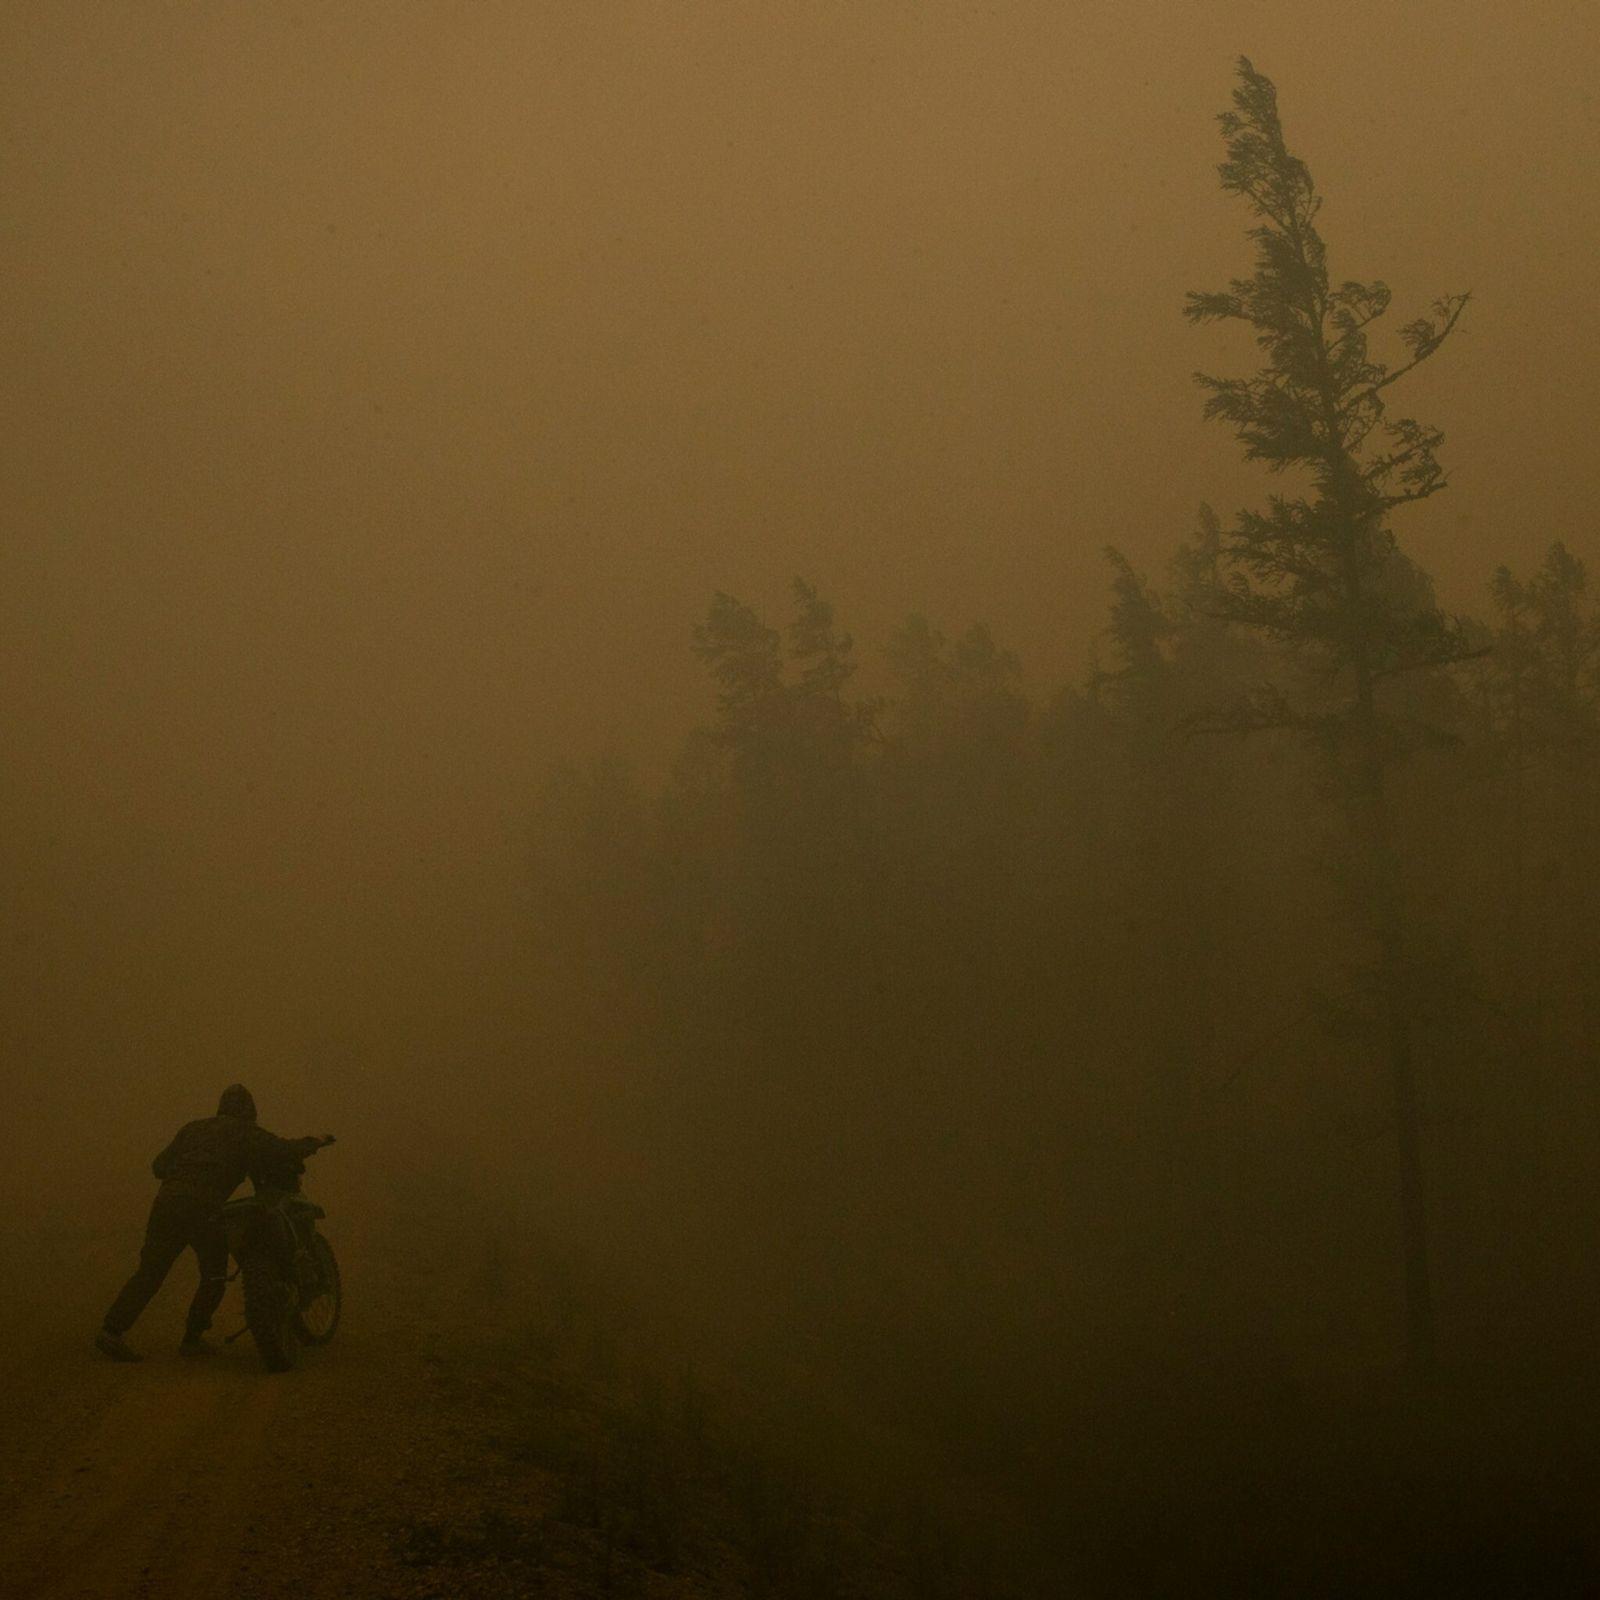 001_Siberian Fires